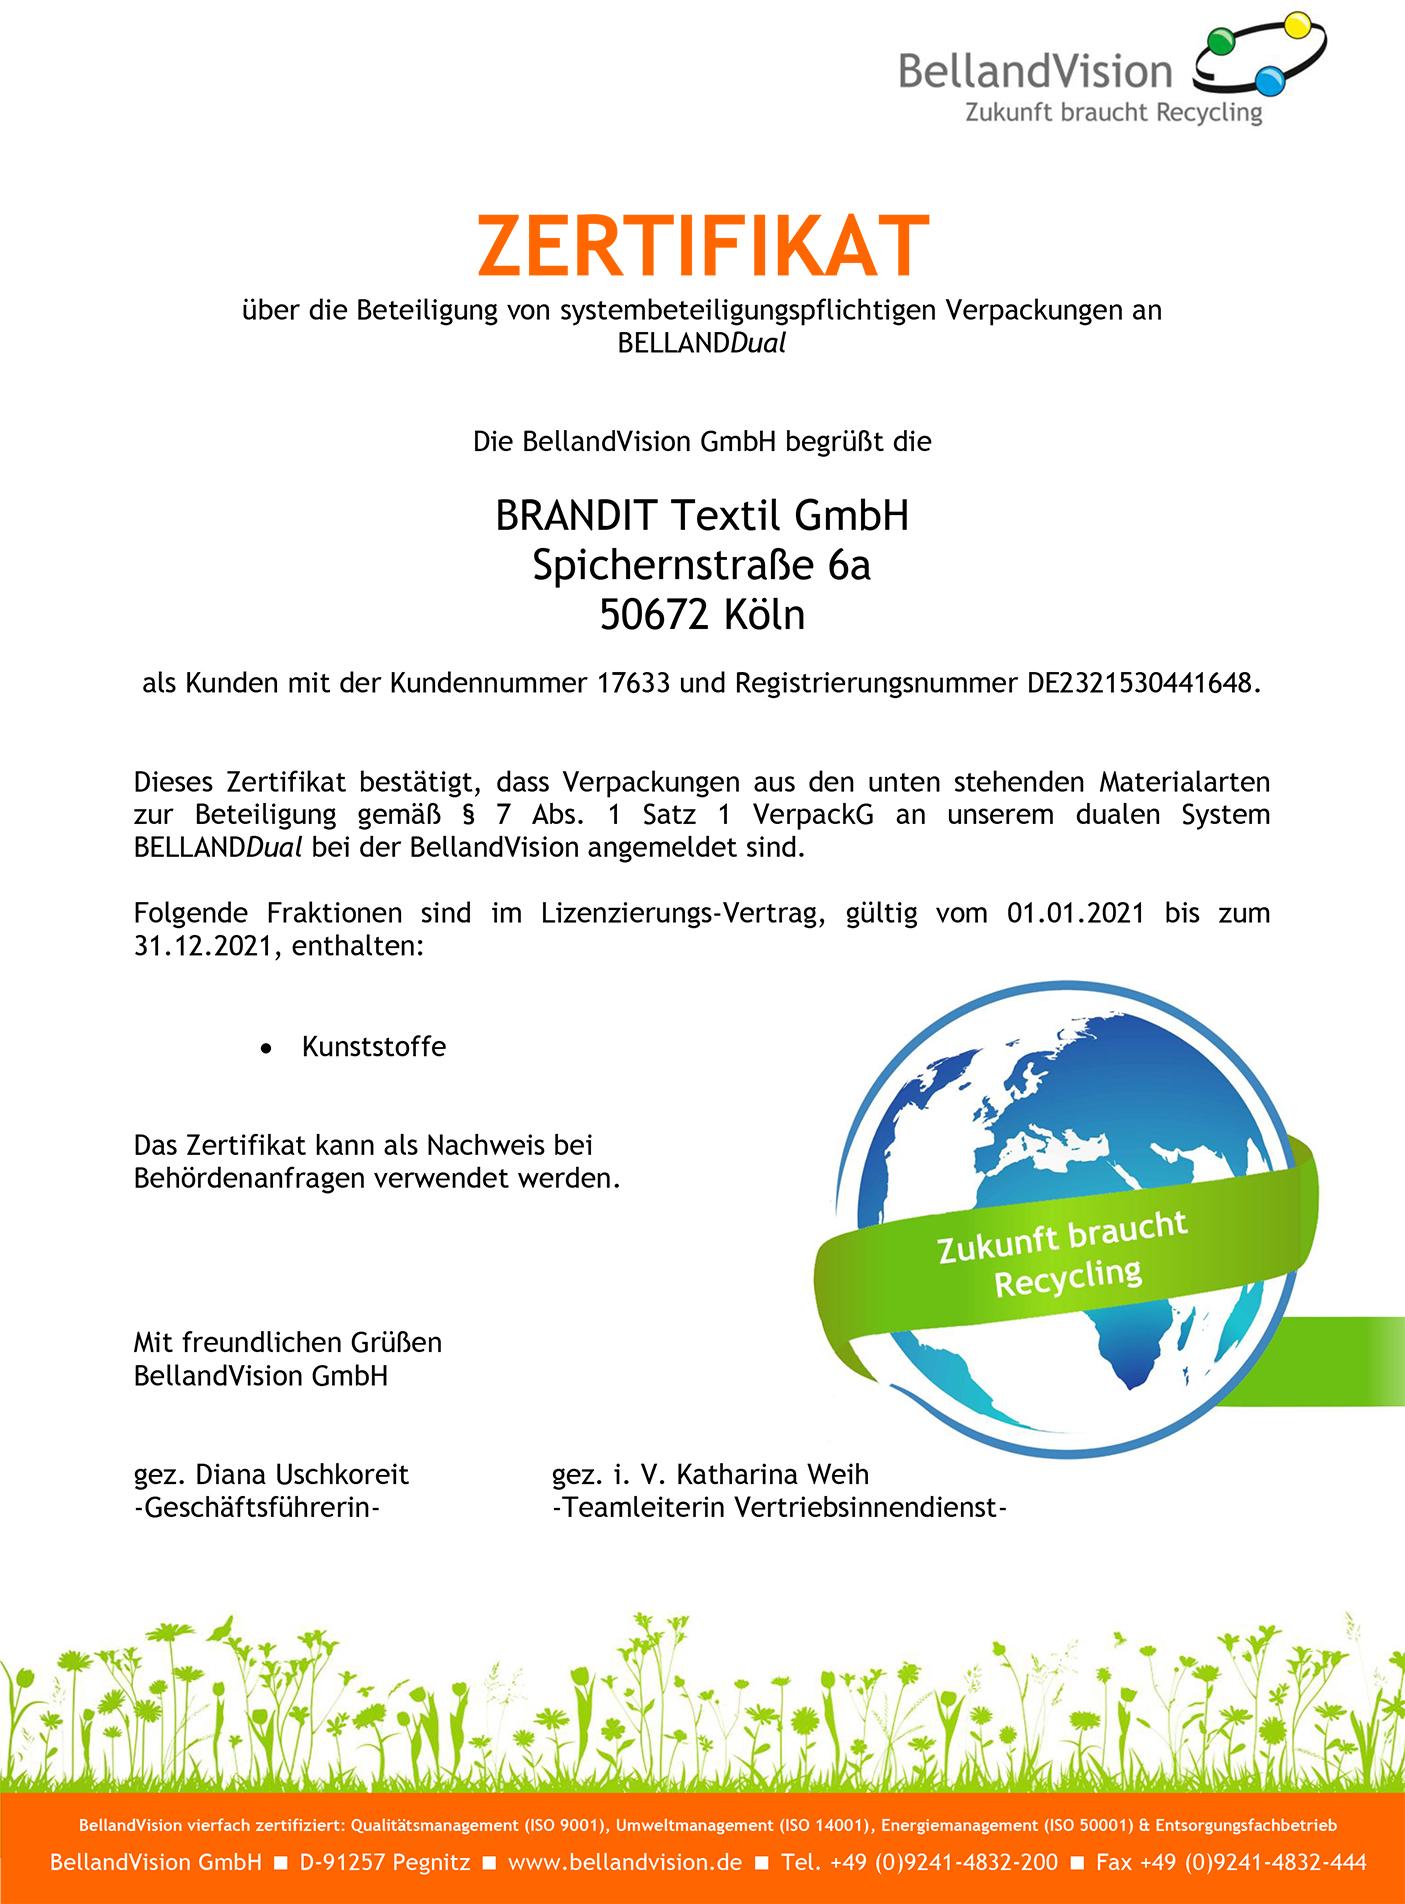 17633-BRANDIT-Textil-GmbH_2021